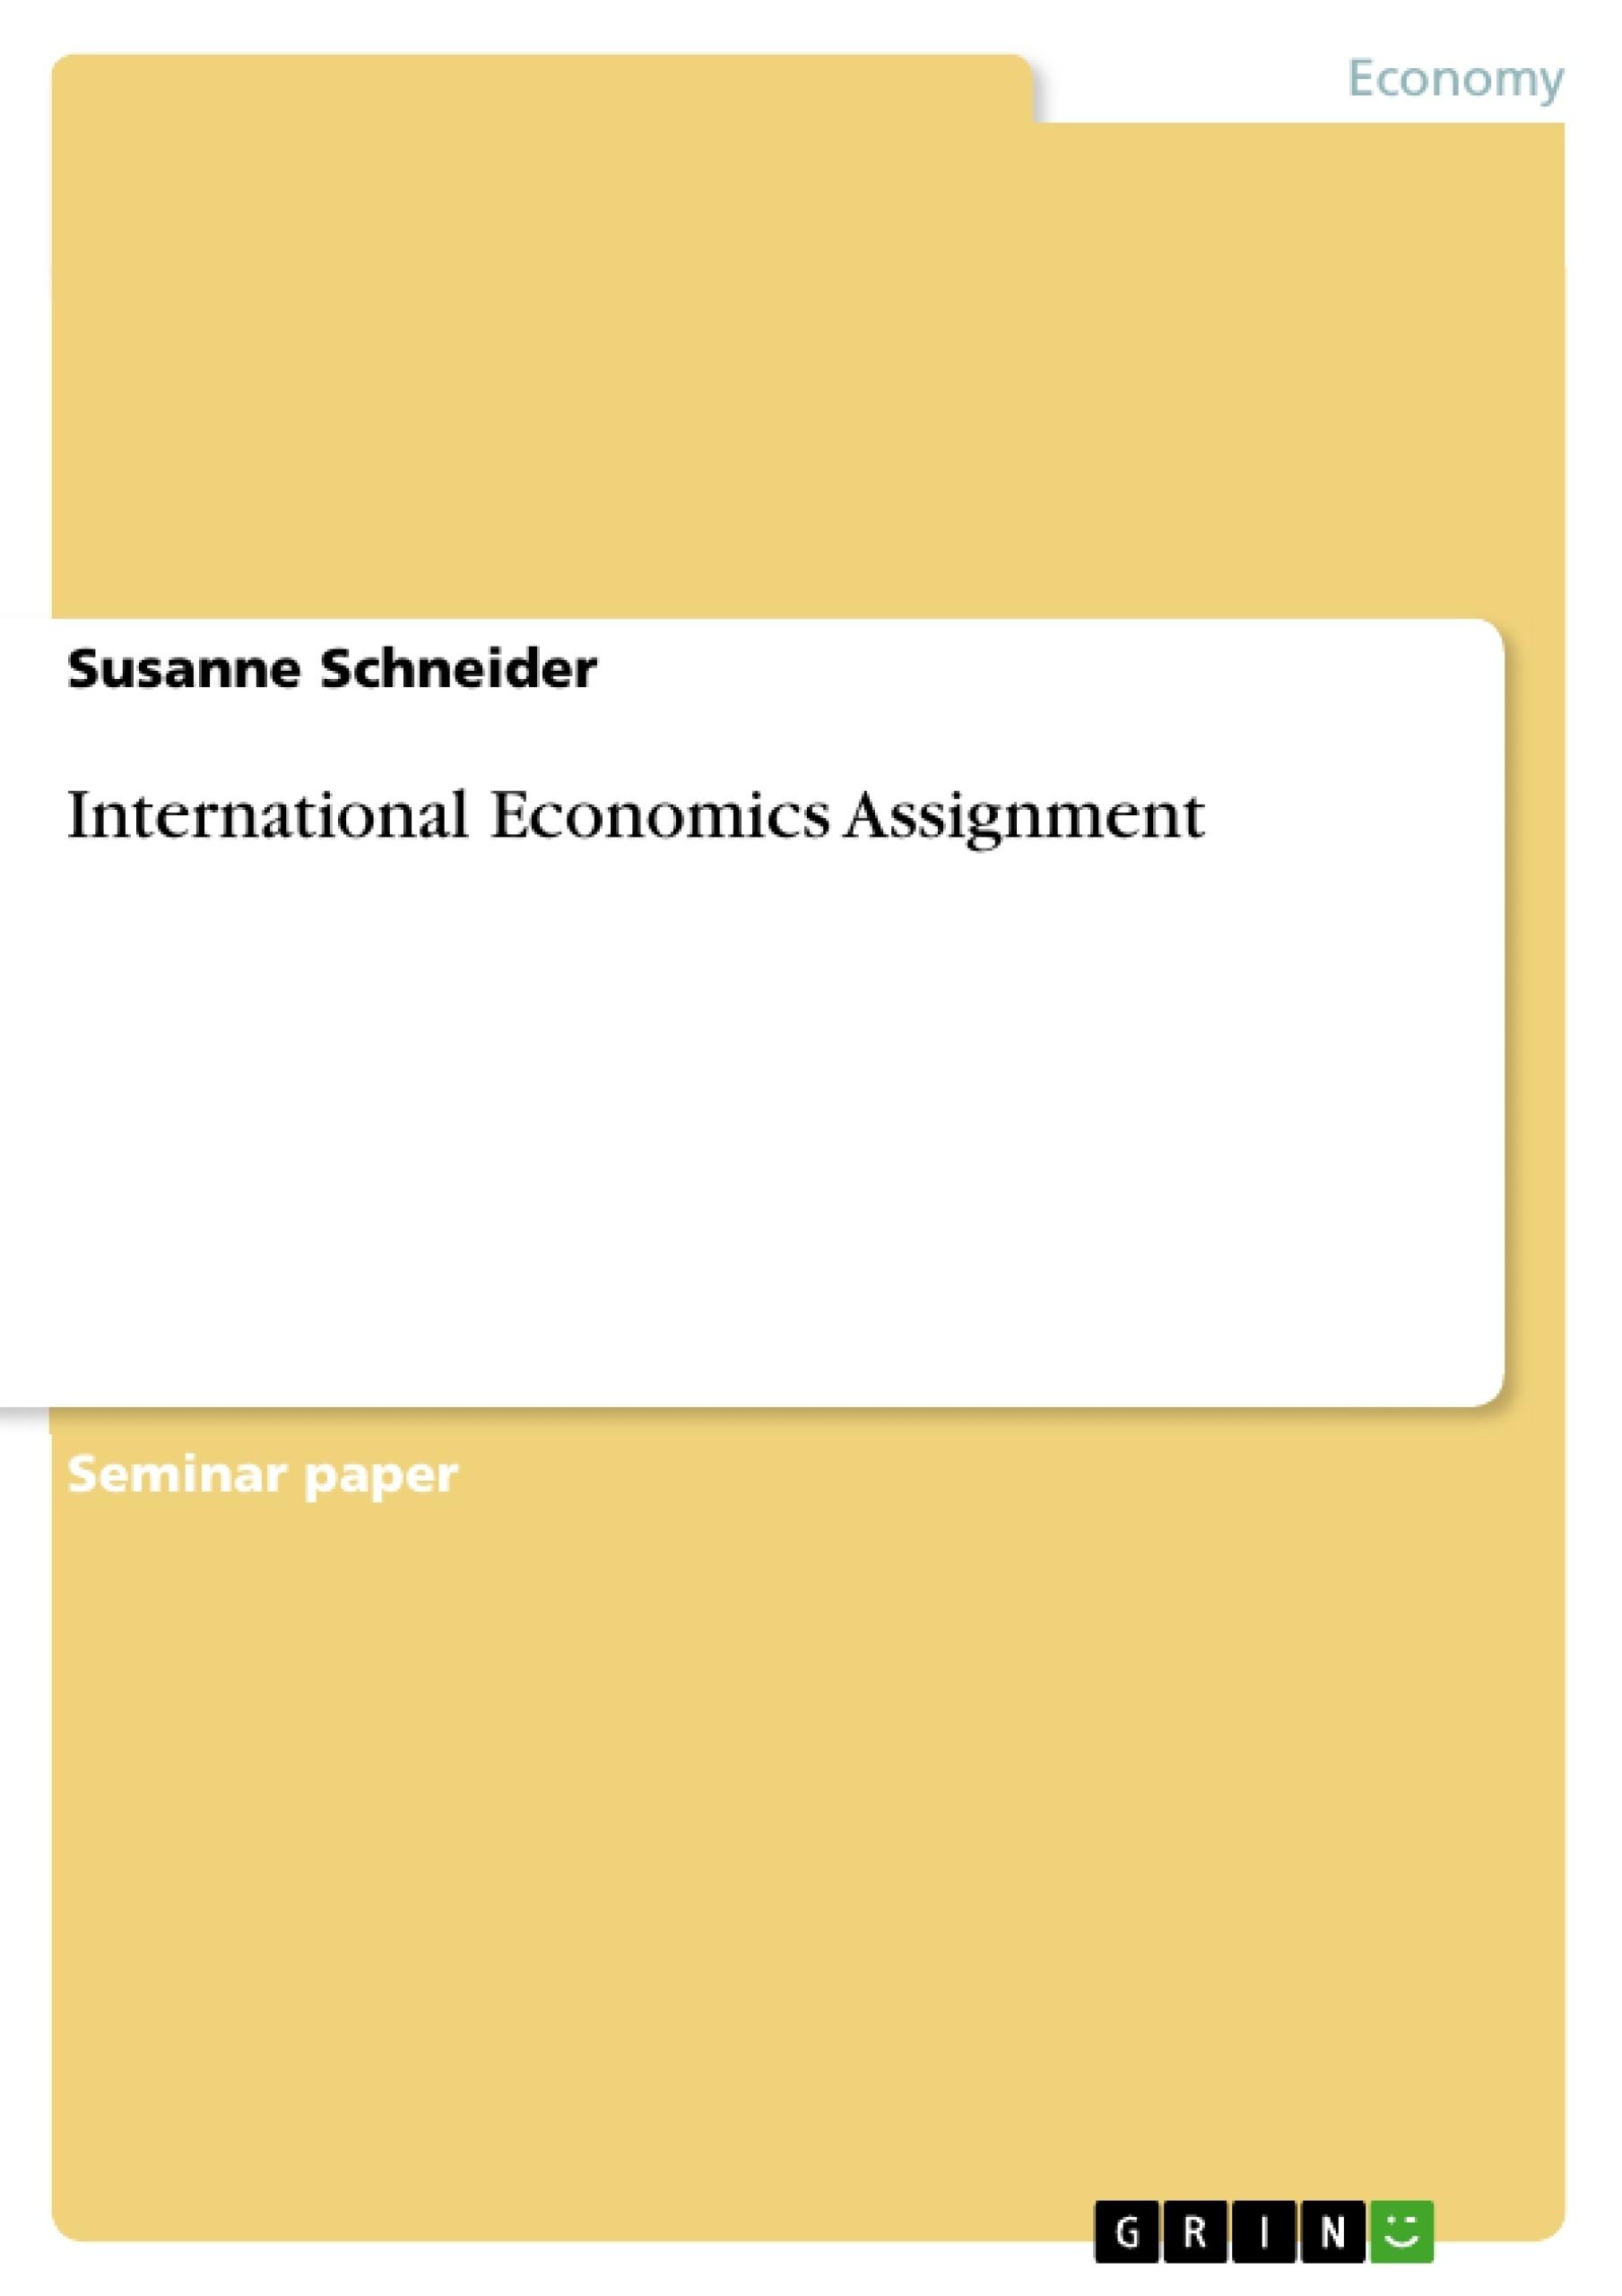 Title: International Economics Assignment